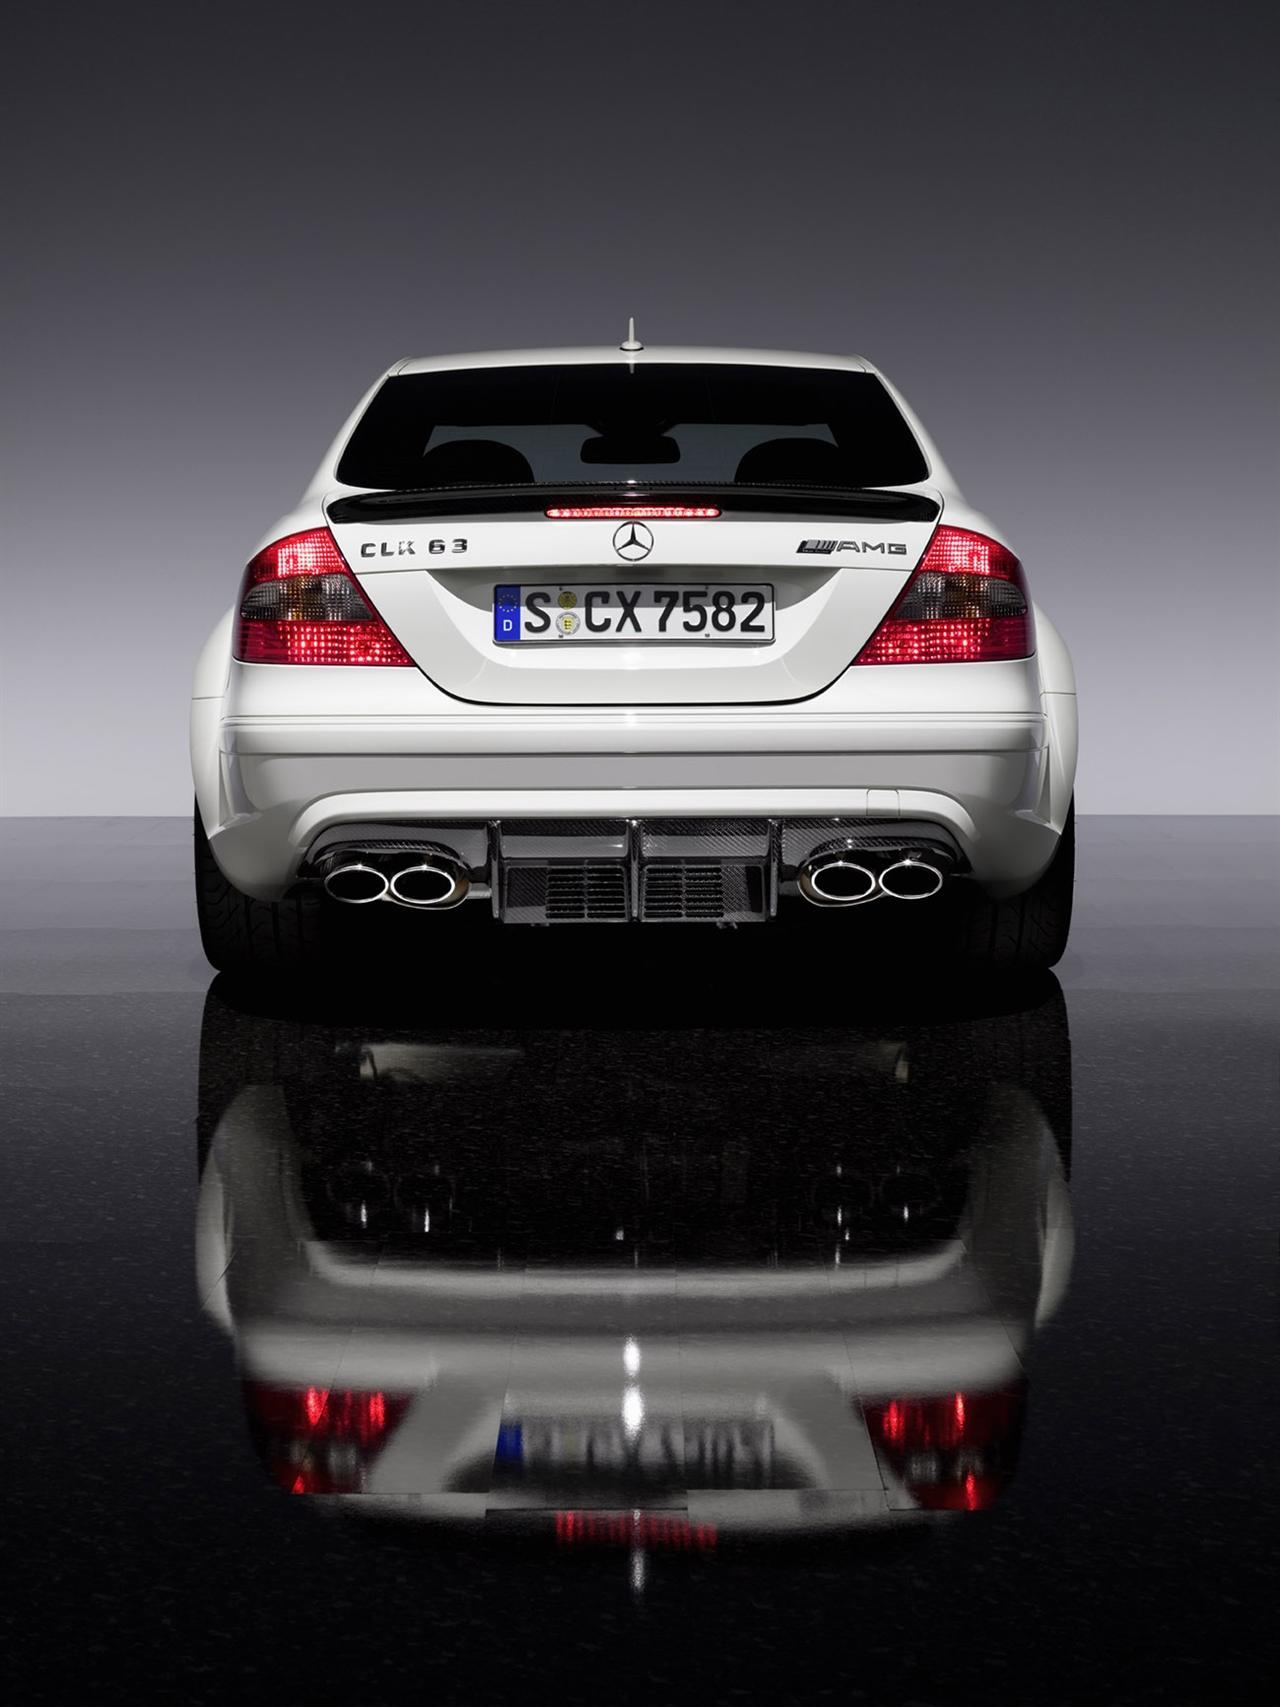 mercedes benz clk63 amg black series photos reviews news specs buy car. Black Bedroom Furniture Sets. Home Design Ideas